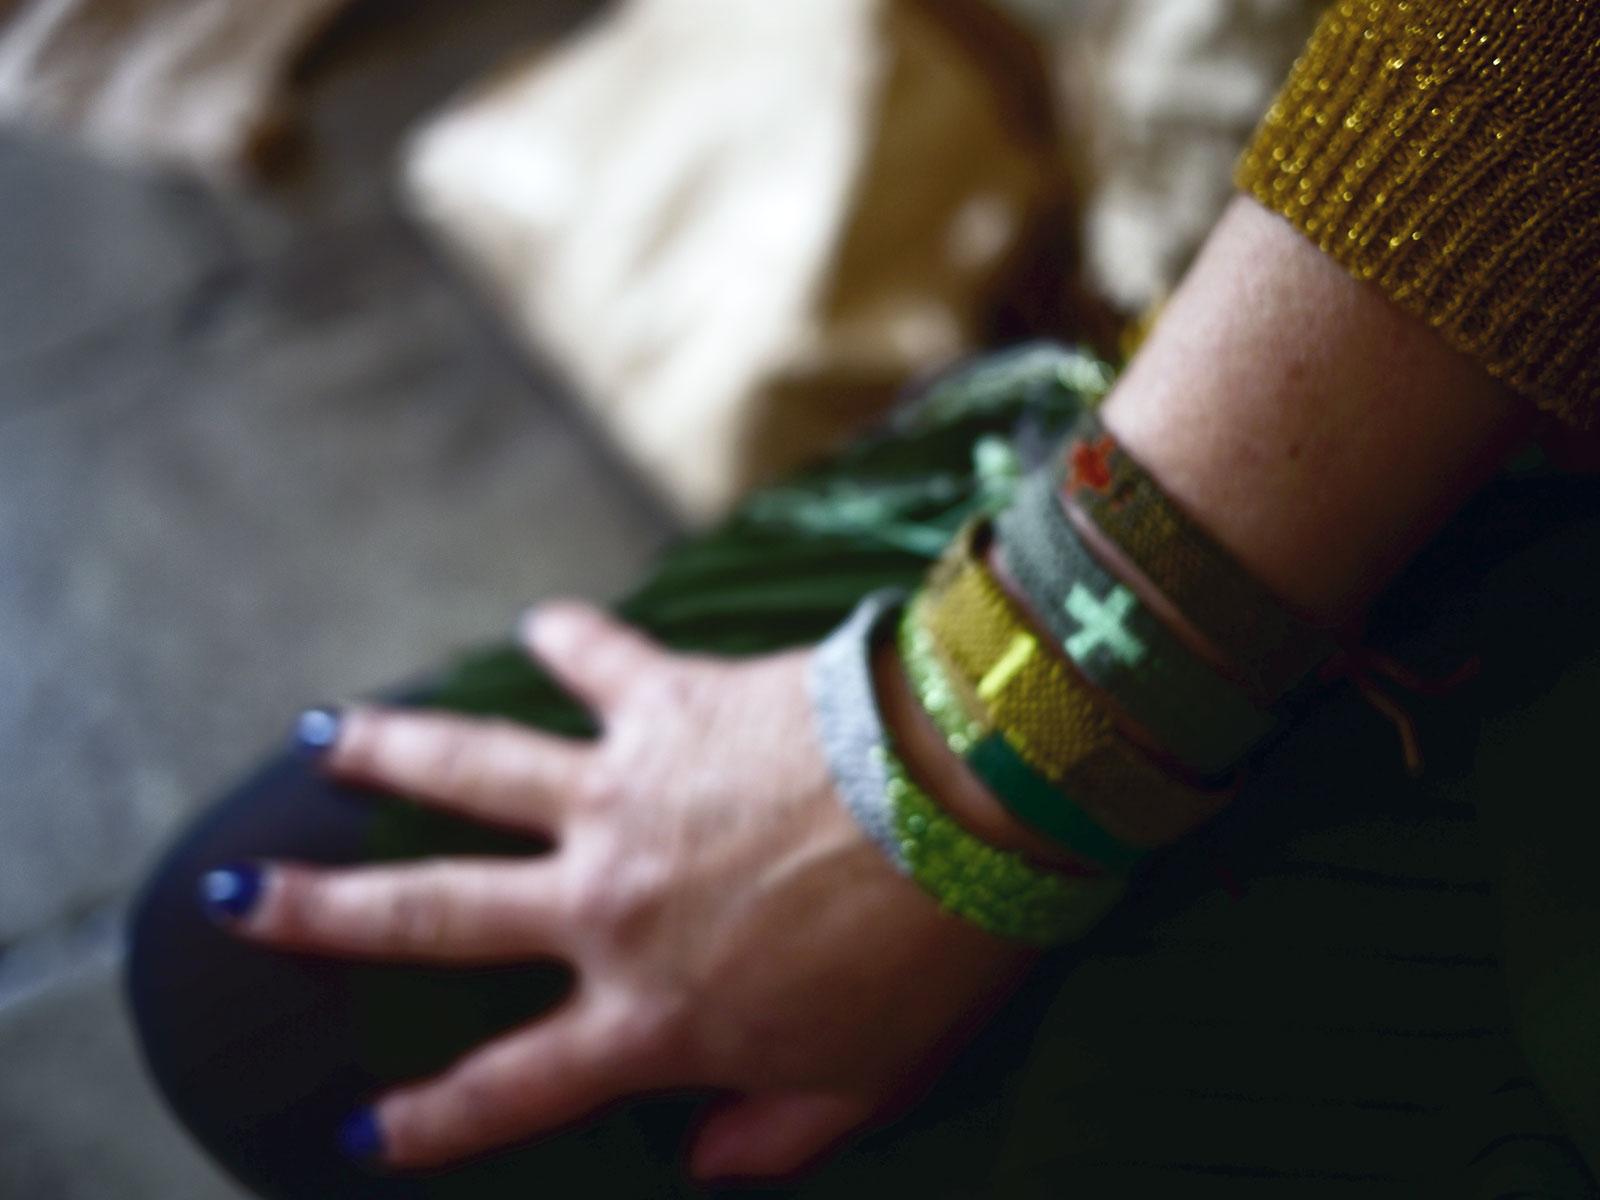 Bracelets LOOM - Design textile by Myriam Balaÿ myriam-balay-bracelet-green GOLD/GREY/GREEN L'appartement